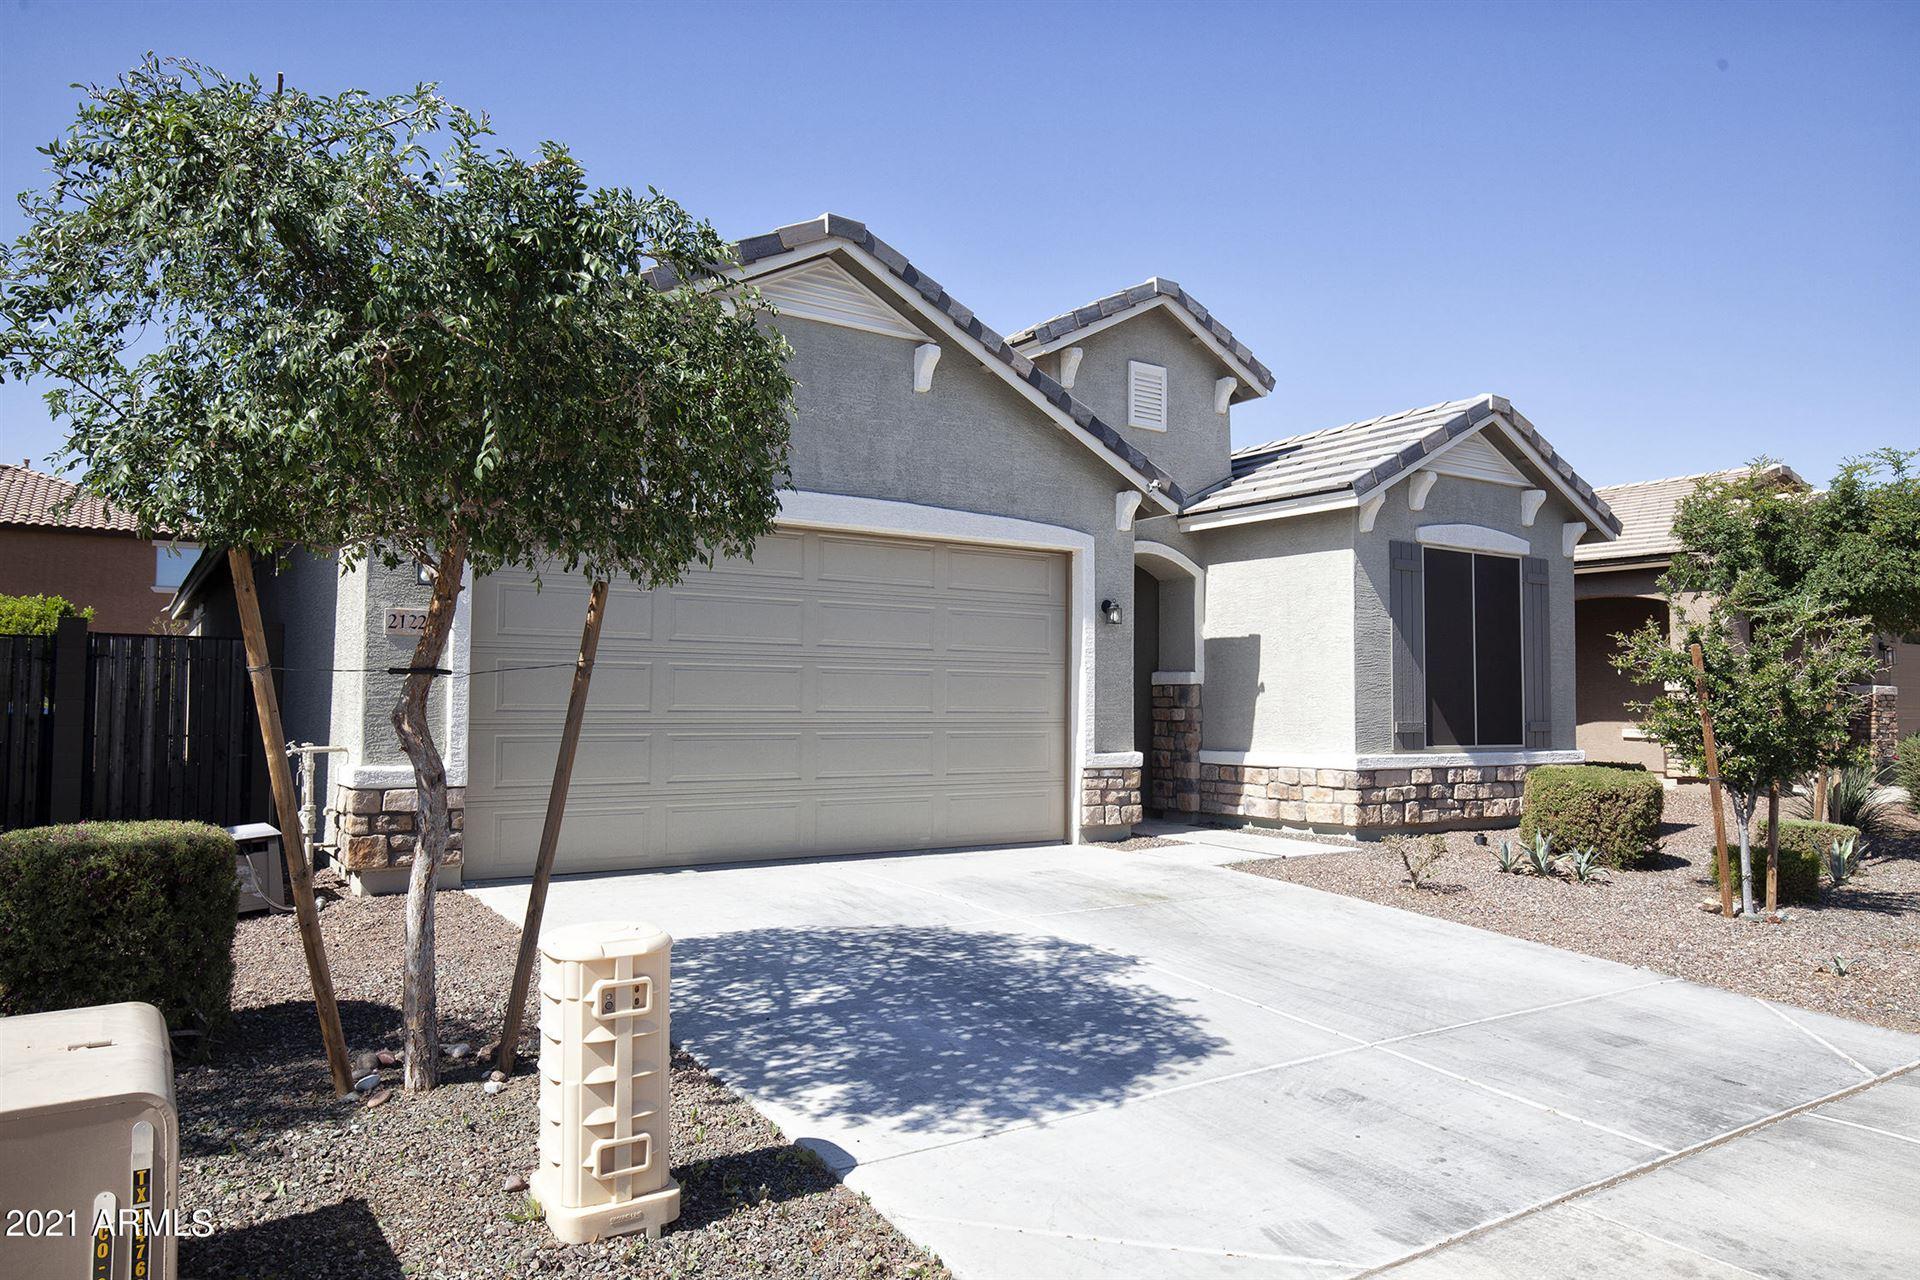 Photo of 21227 W BERKELEY Road, Buckeye, AZ 85396 (MLS # 6231828)